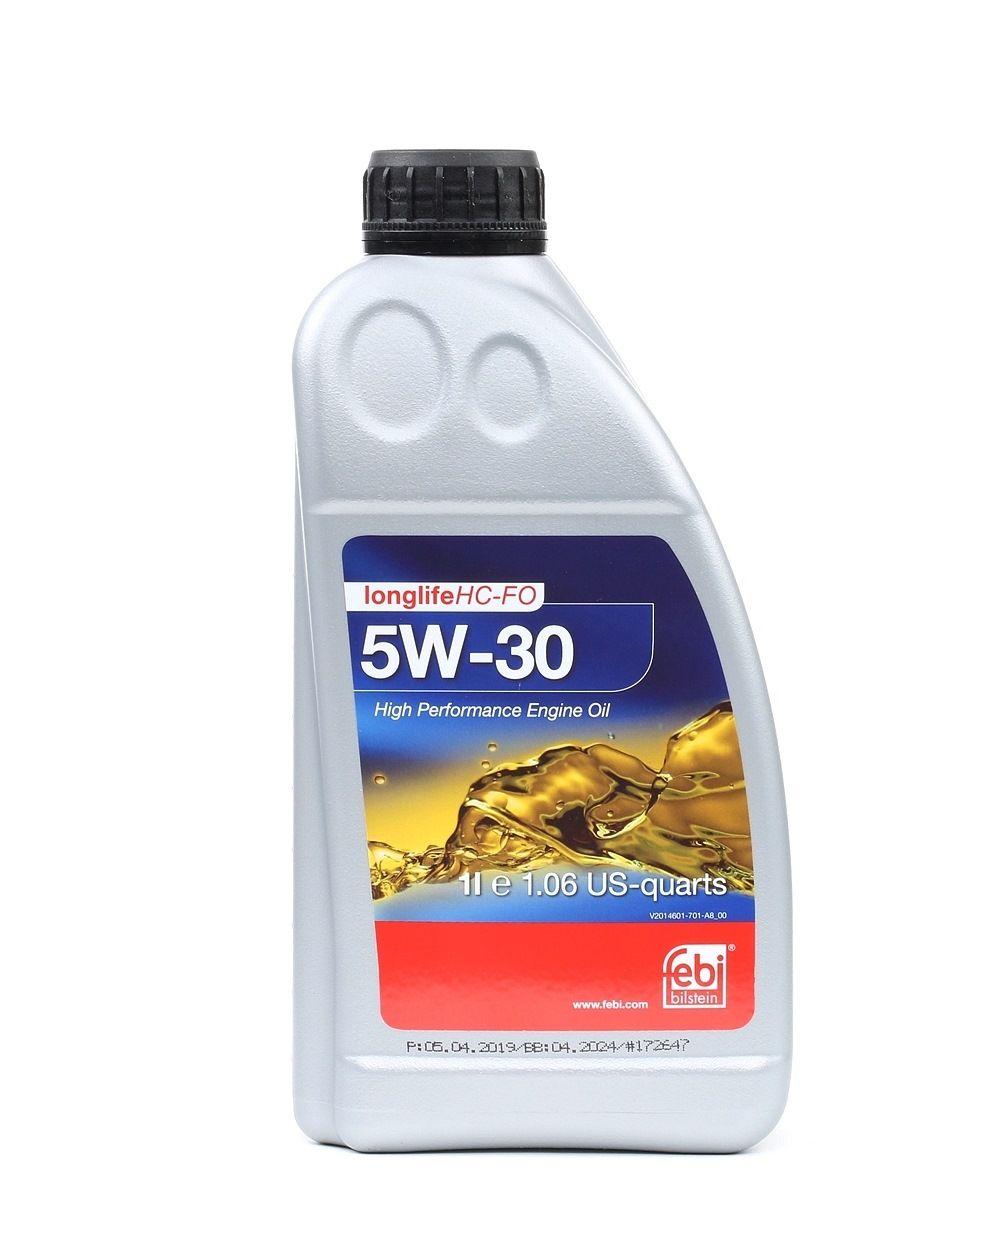 STJLR035003 FEBI BILSTEIN Longlife, HC-FO 5W-30, 1l Motoröl 101150 günstig kaufen